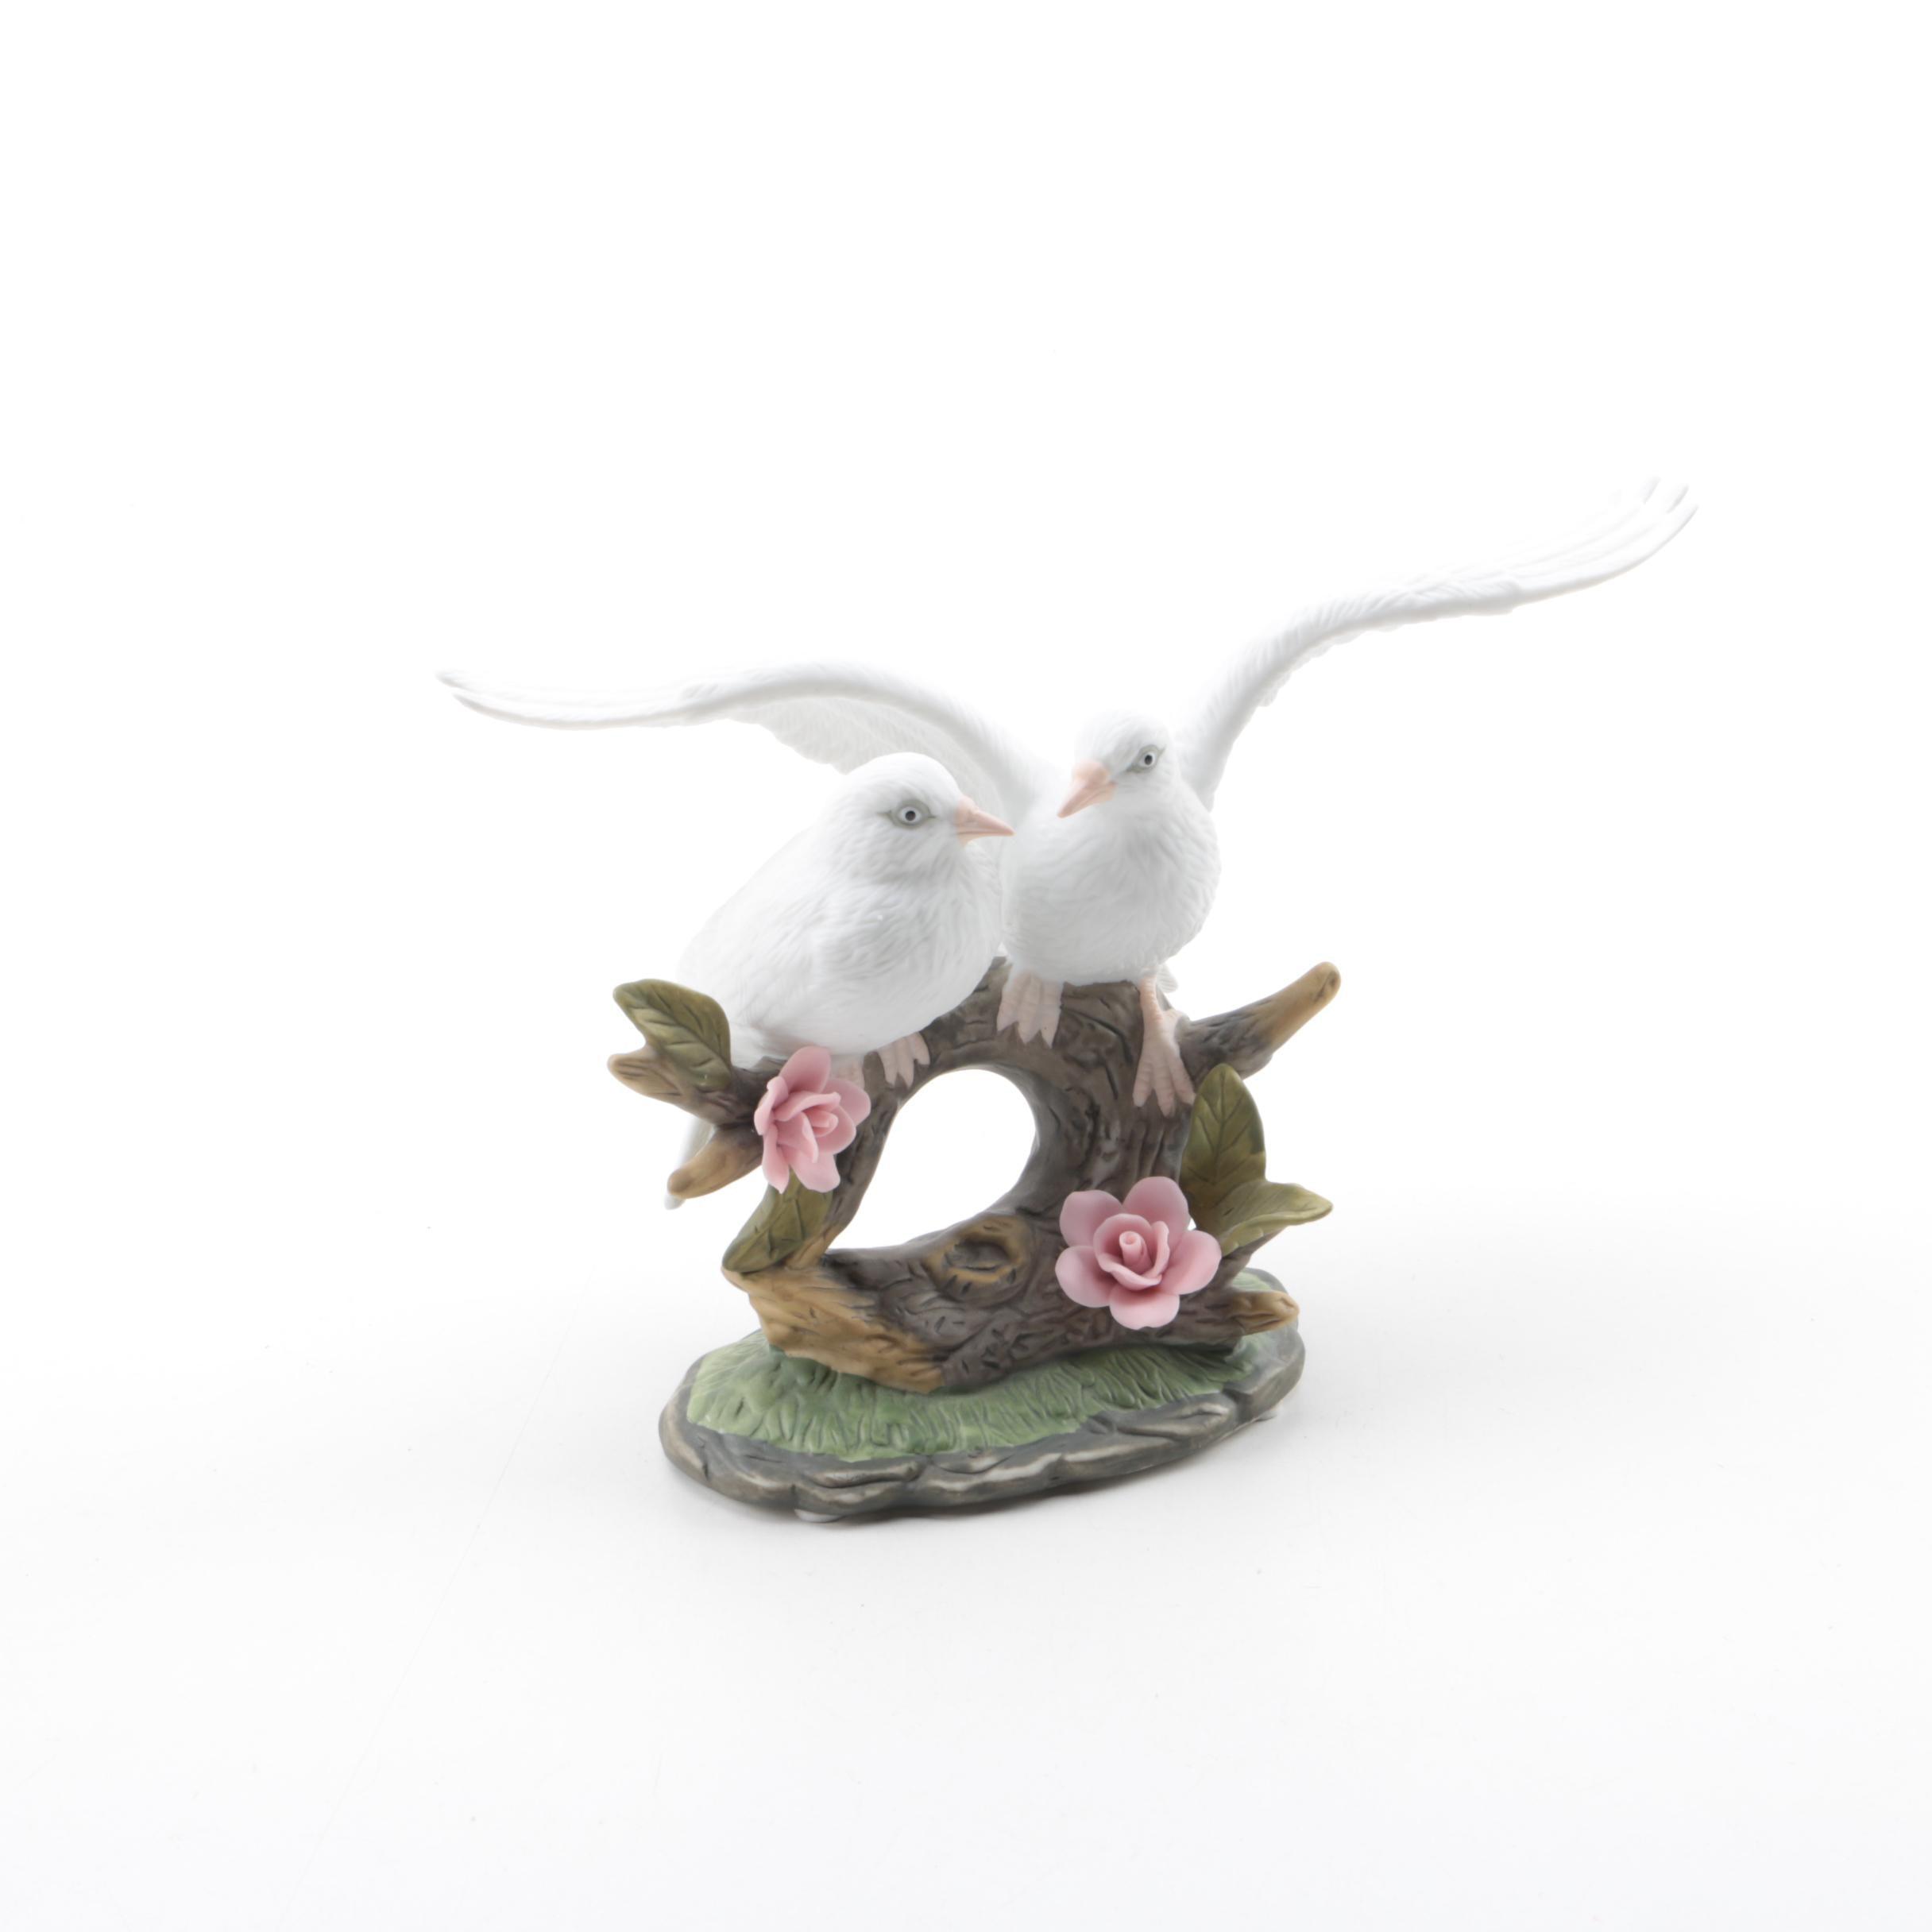 Wellington Collection Porcelain Bird Figurine